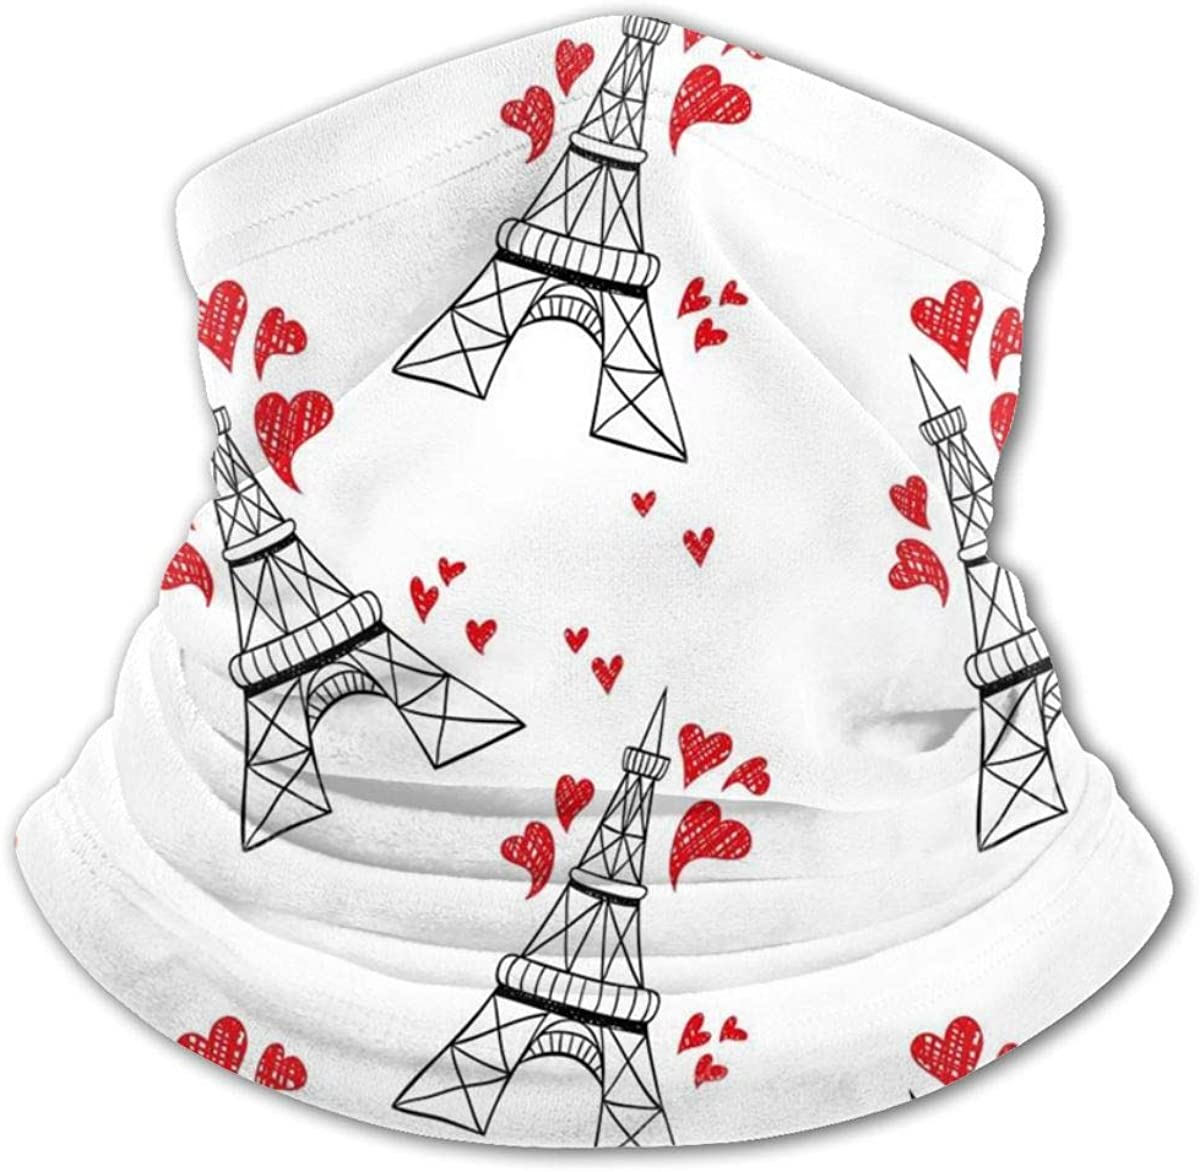 Eiffel Tower Headwear For Girls And Boys, Head Wrap, Neck Gaiter, Headband, Tenn Fishing Mask, Magic Scarf, Tube Mask, Face Bandana Mask For Camping Running Cycling